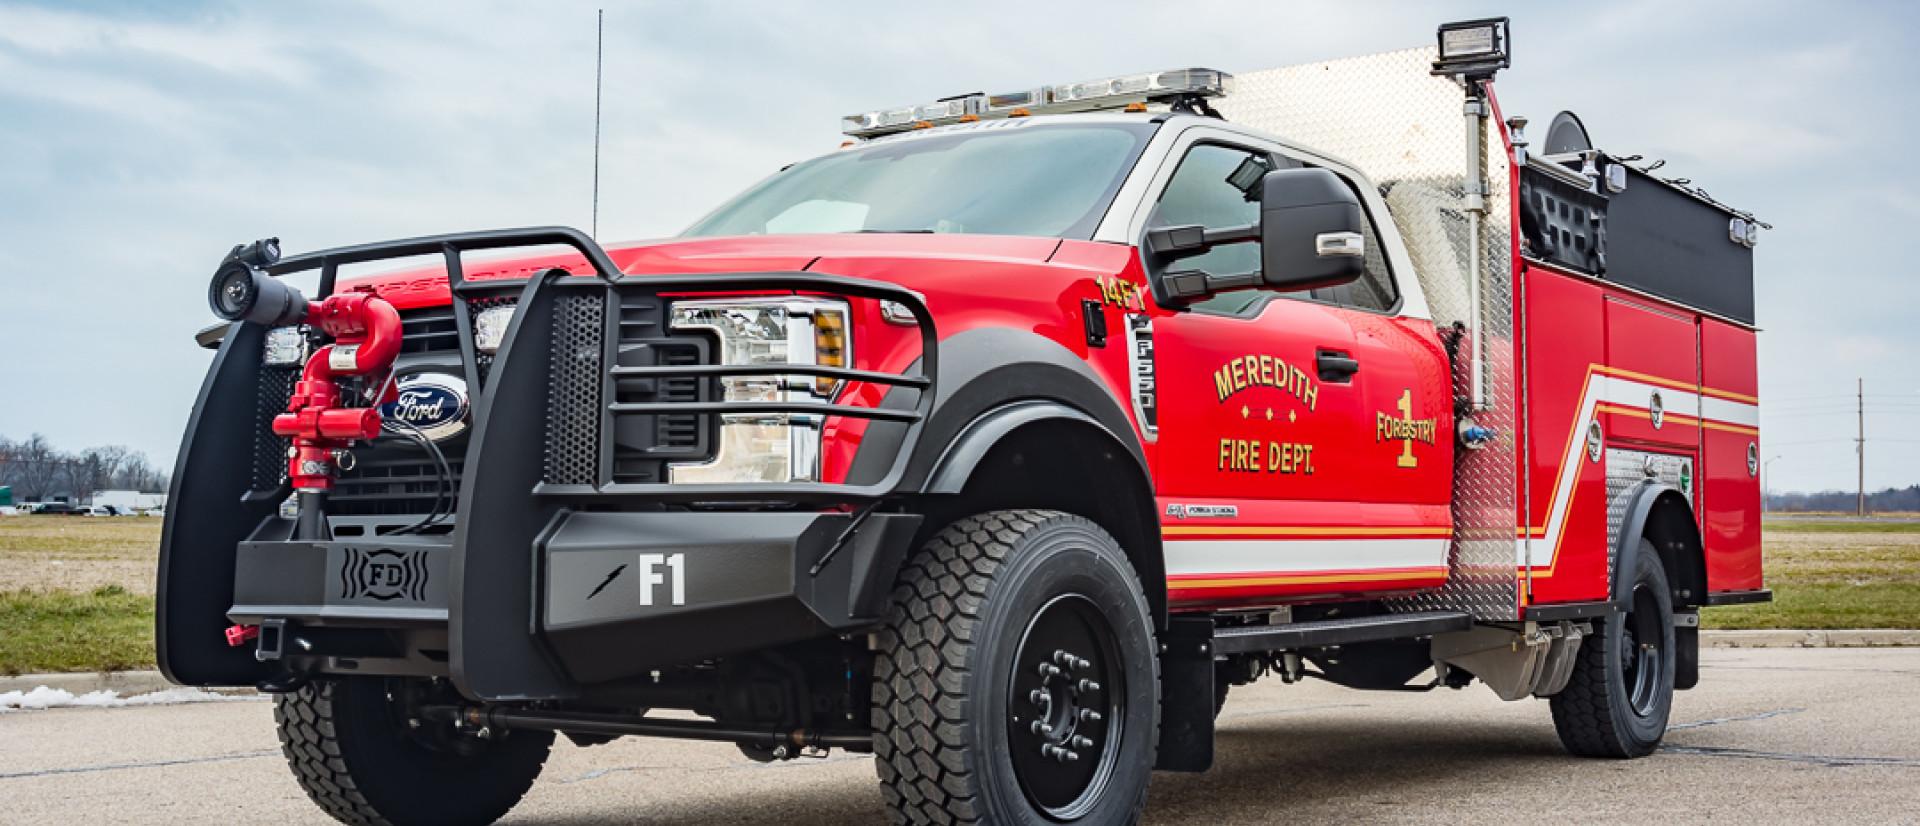 Brush Truck Fire Series Bumper